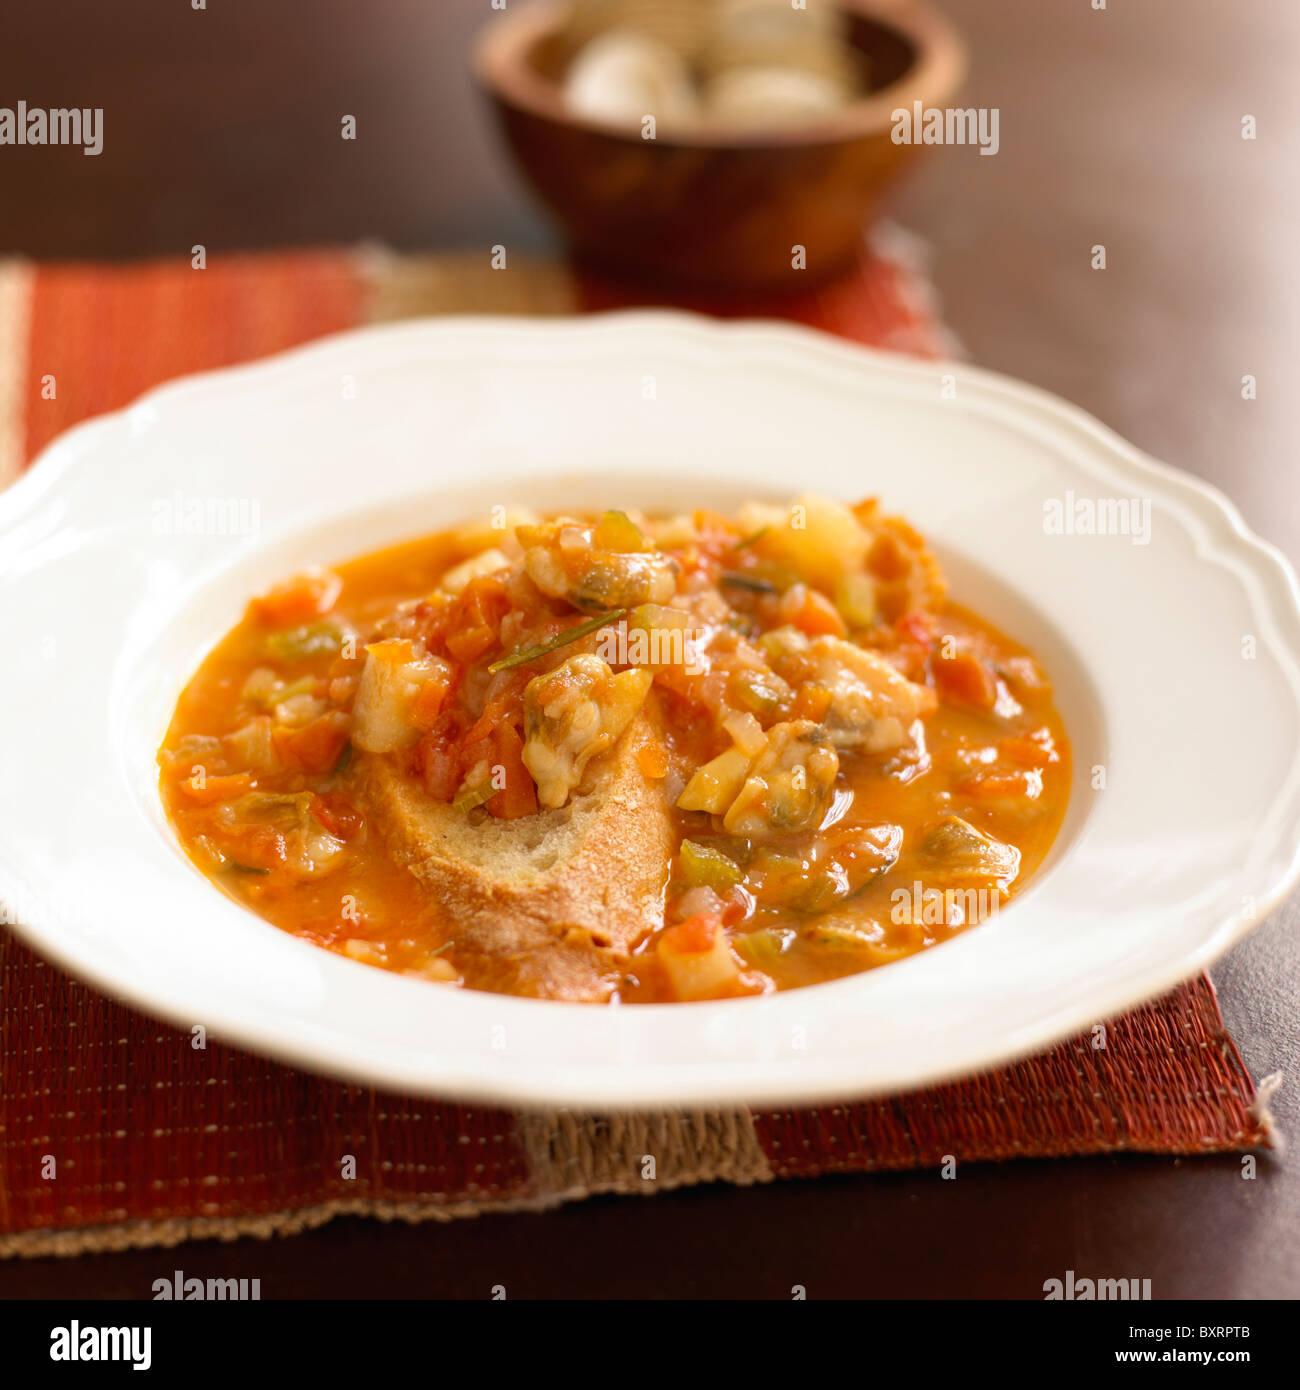 Klobige Kartoffel-Muschel Suppe mit knusprigem Brot Stockbild